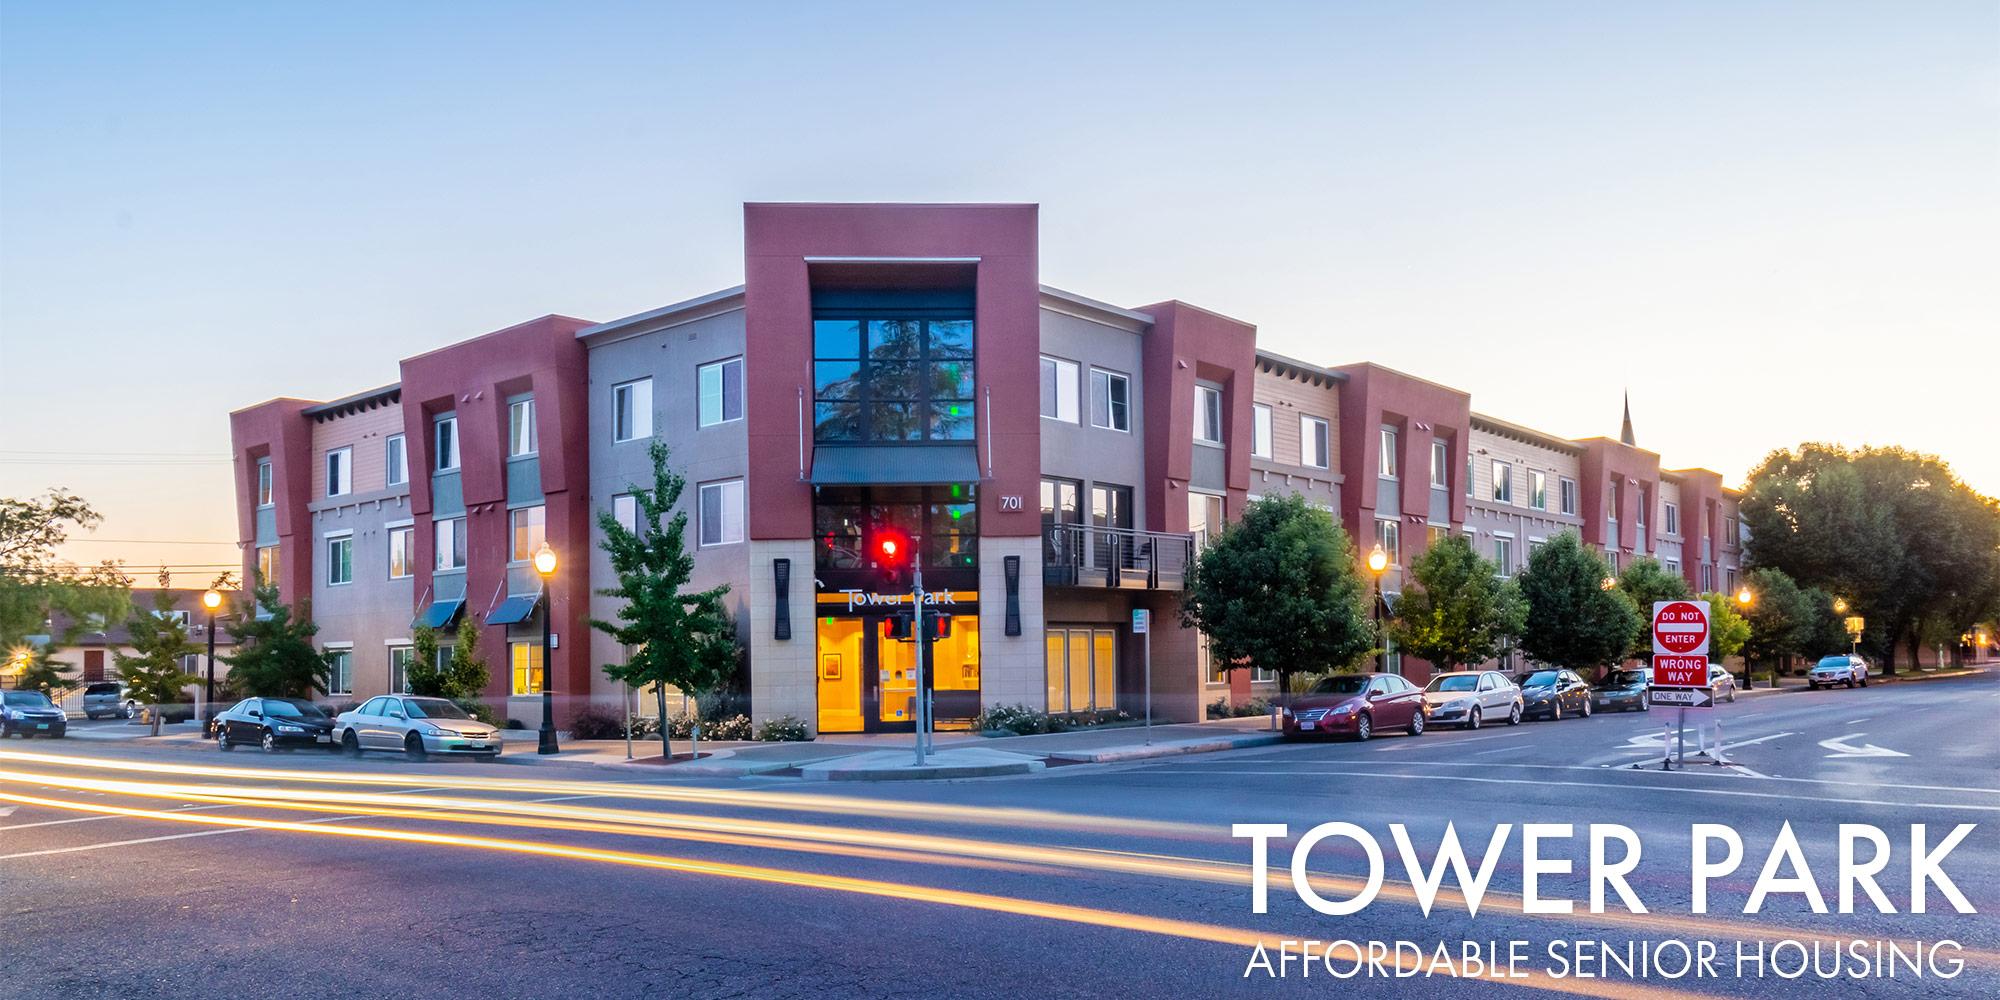 Tower-Park-Affordable-Senior-Housing-Final